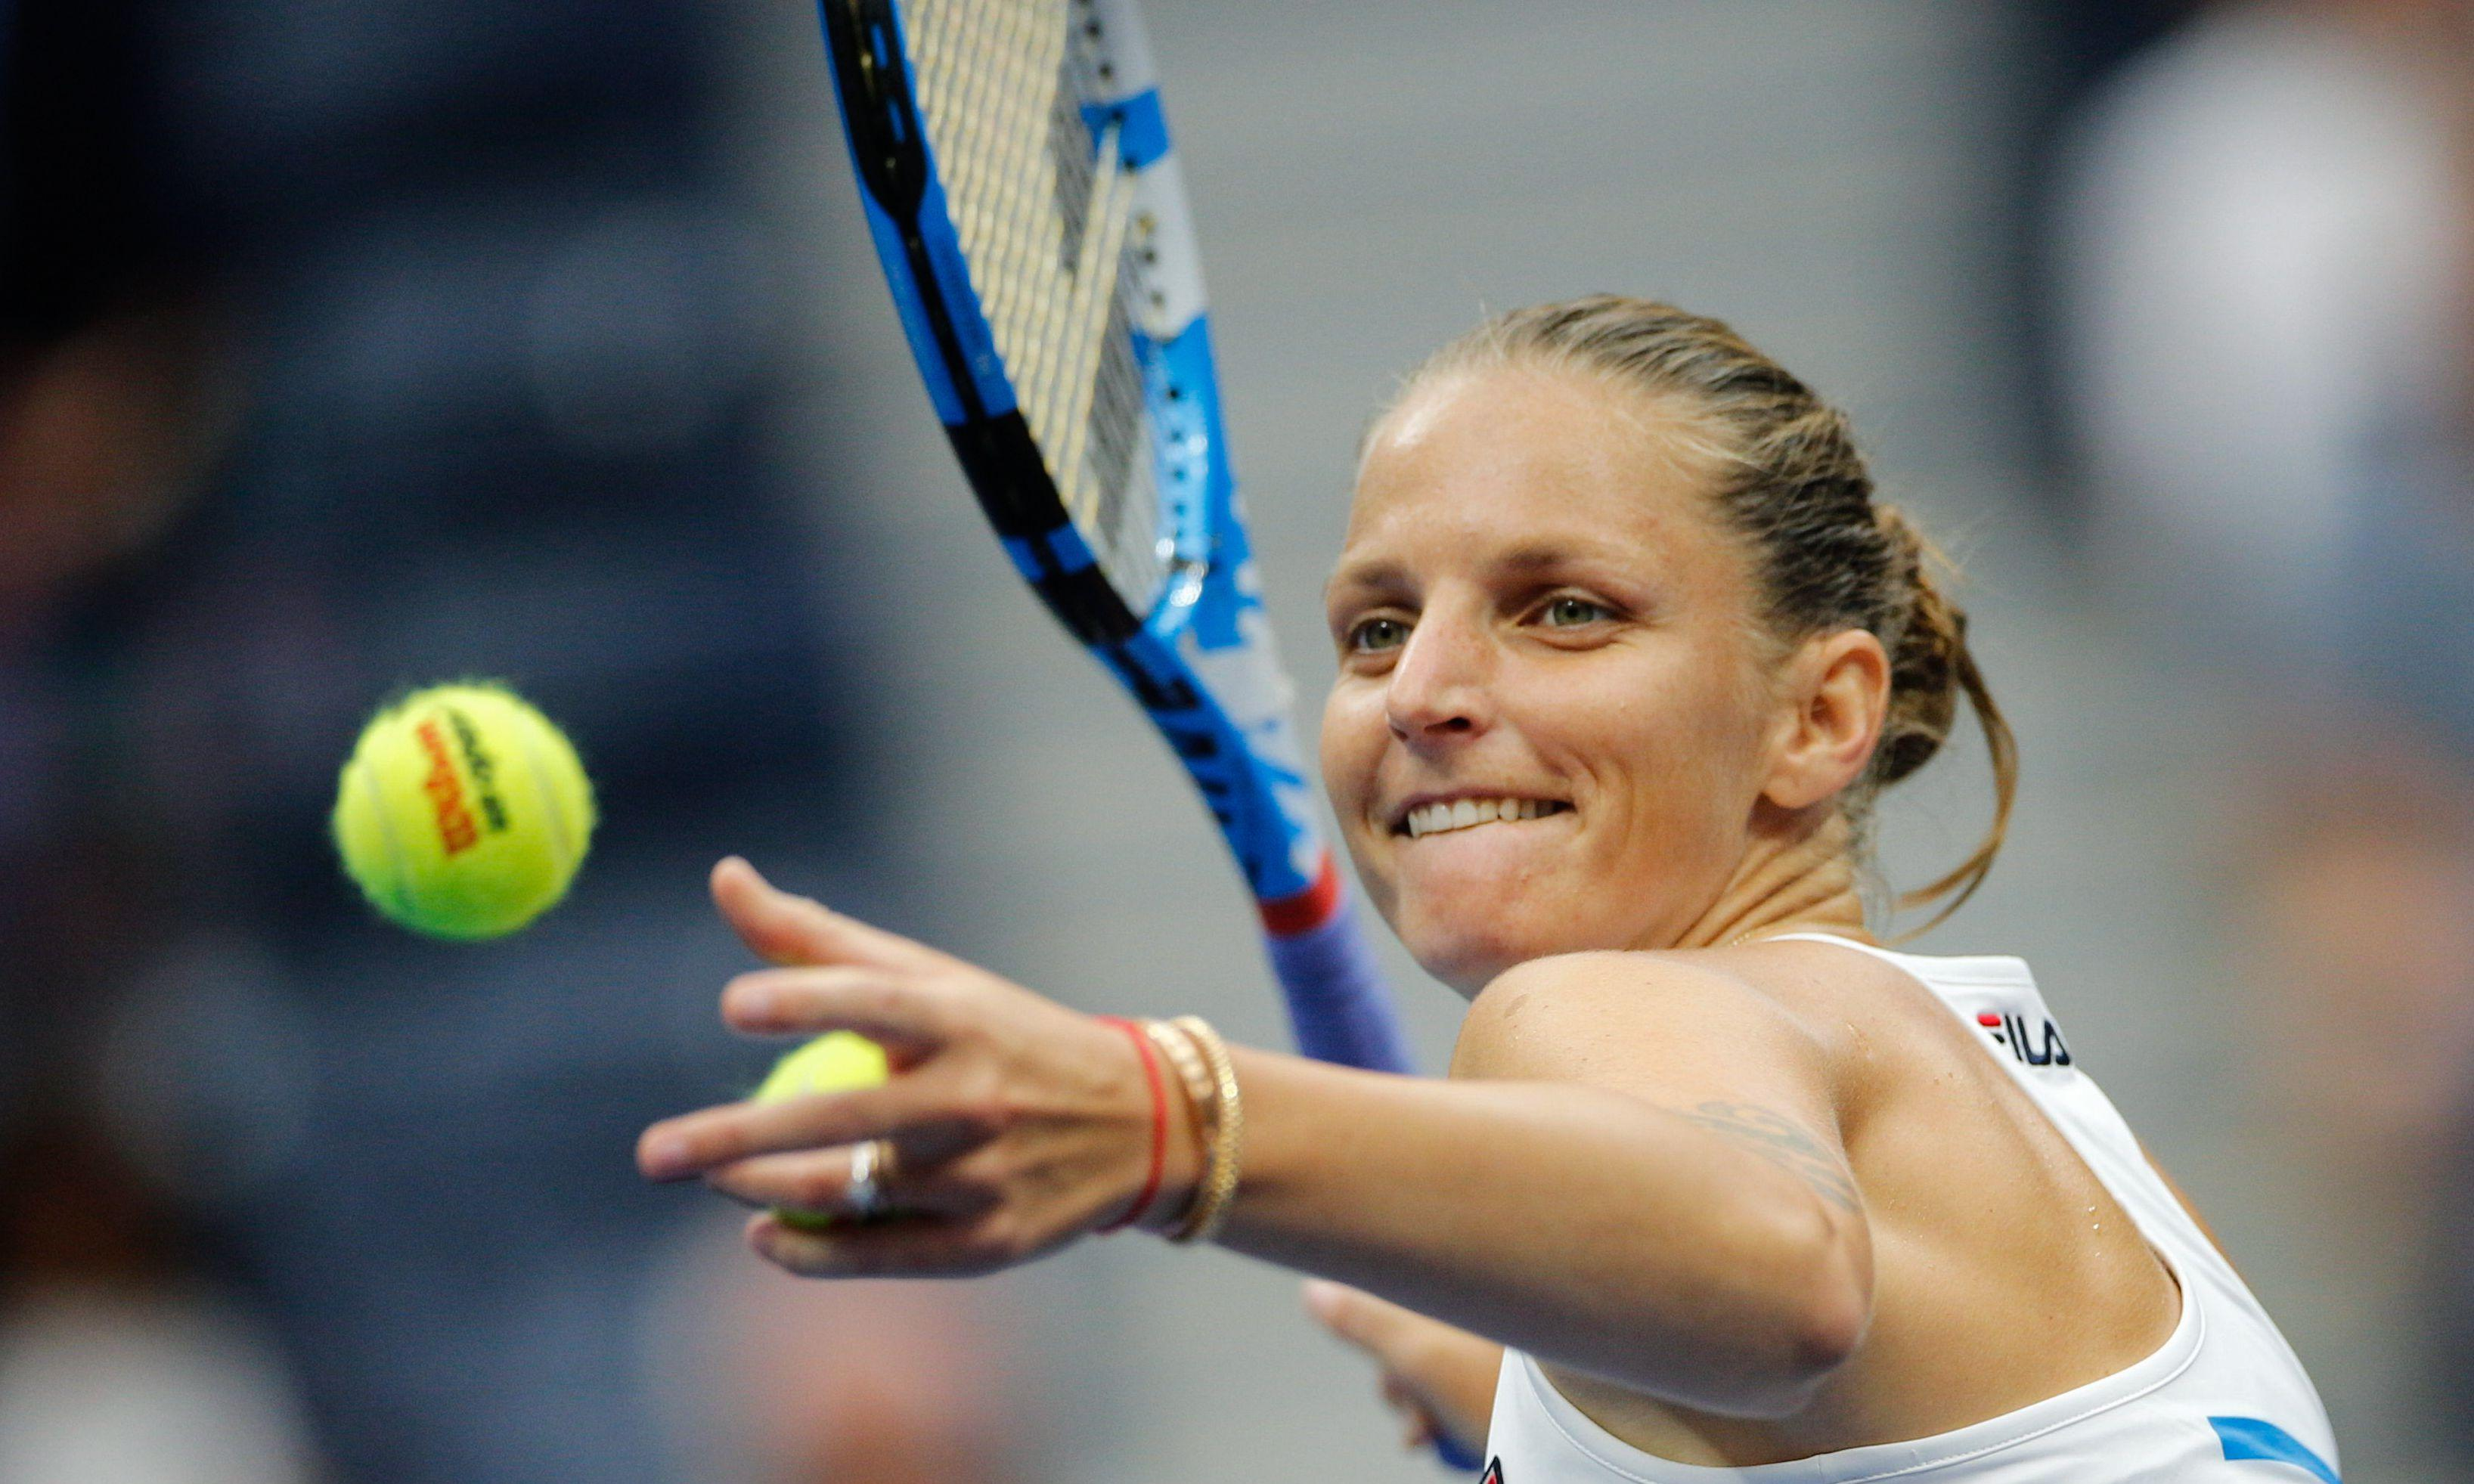 Karolina Pliskova turns on the power to beat Mariam Bolkvadze in US Open